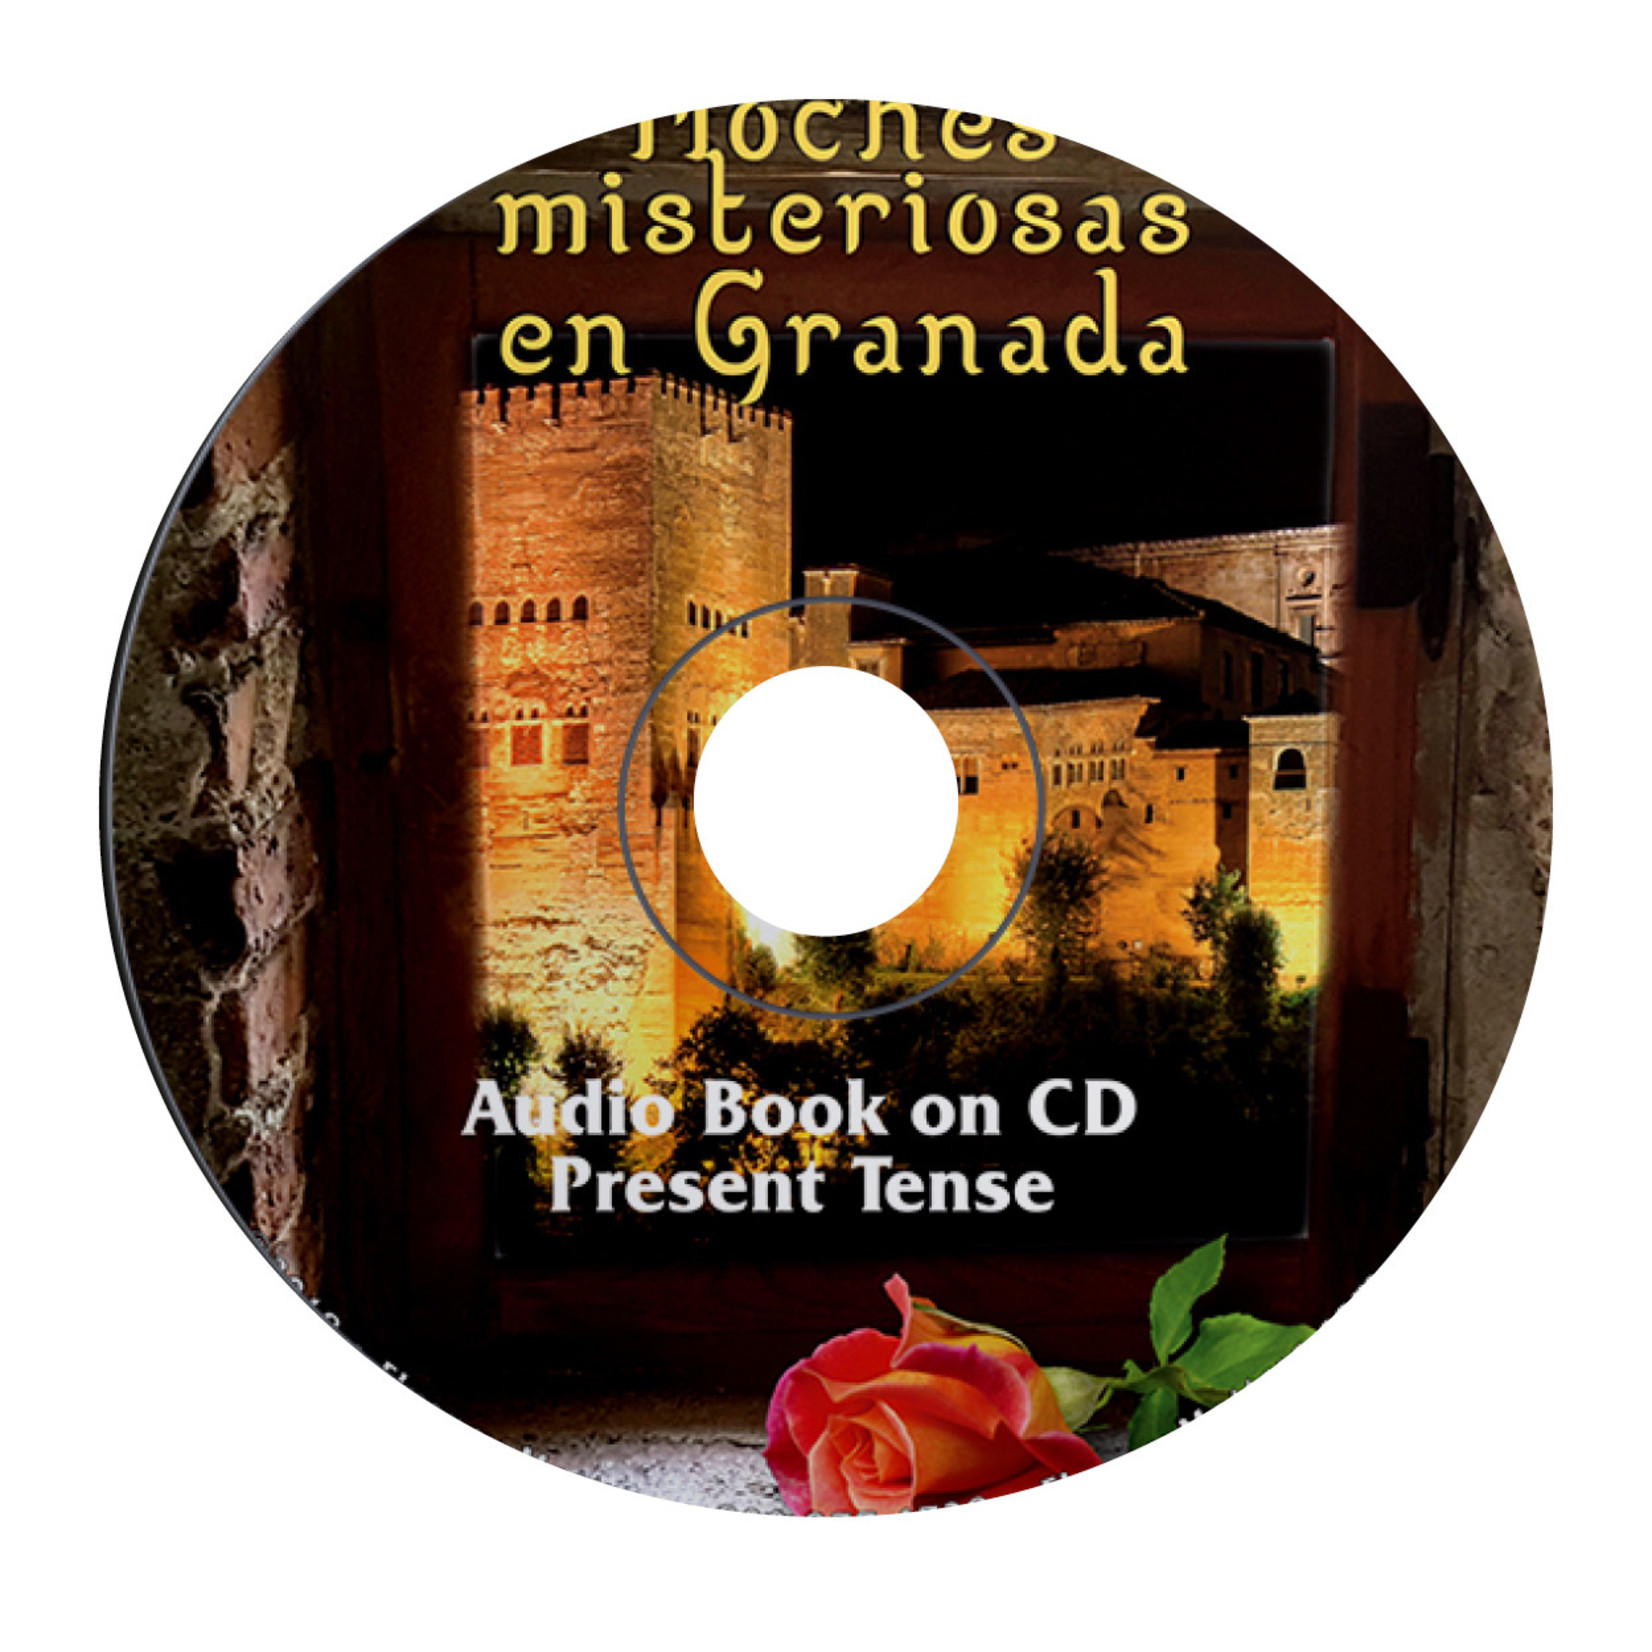 Fluency Matters Noches misteriosas en Granada - Luisterboek